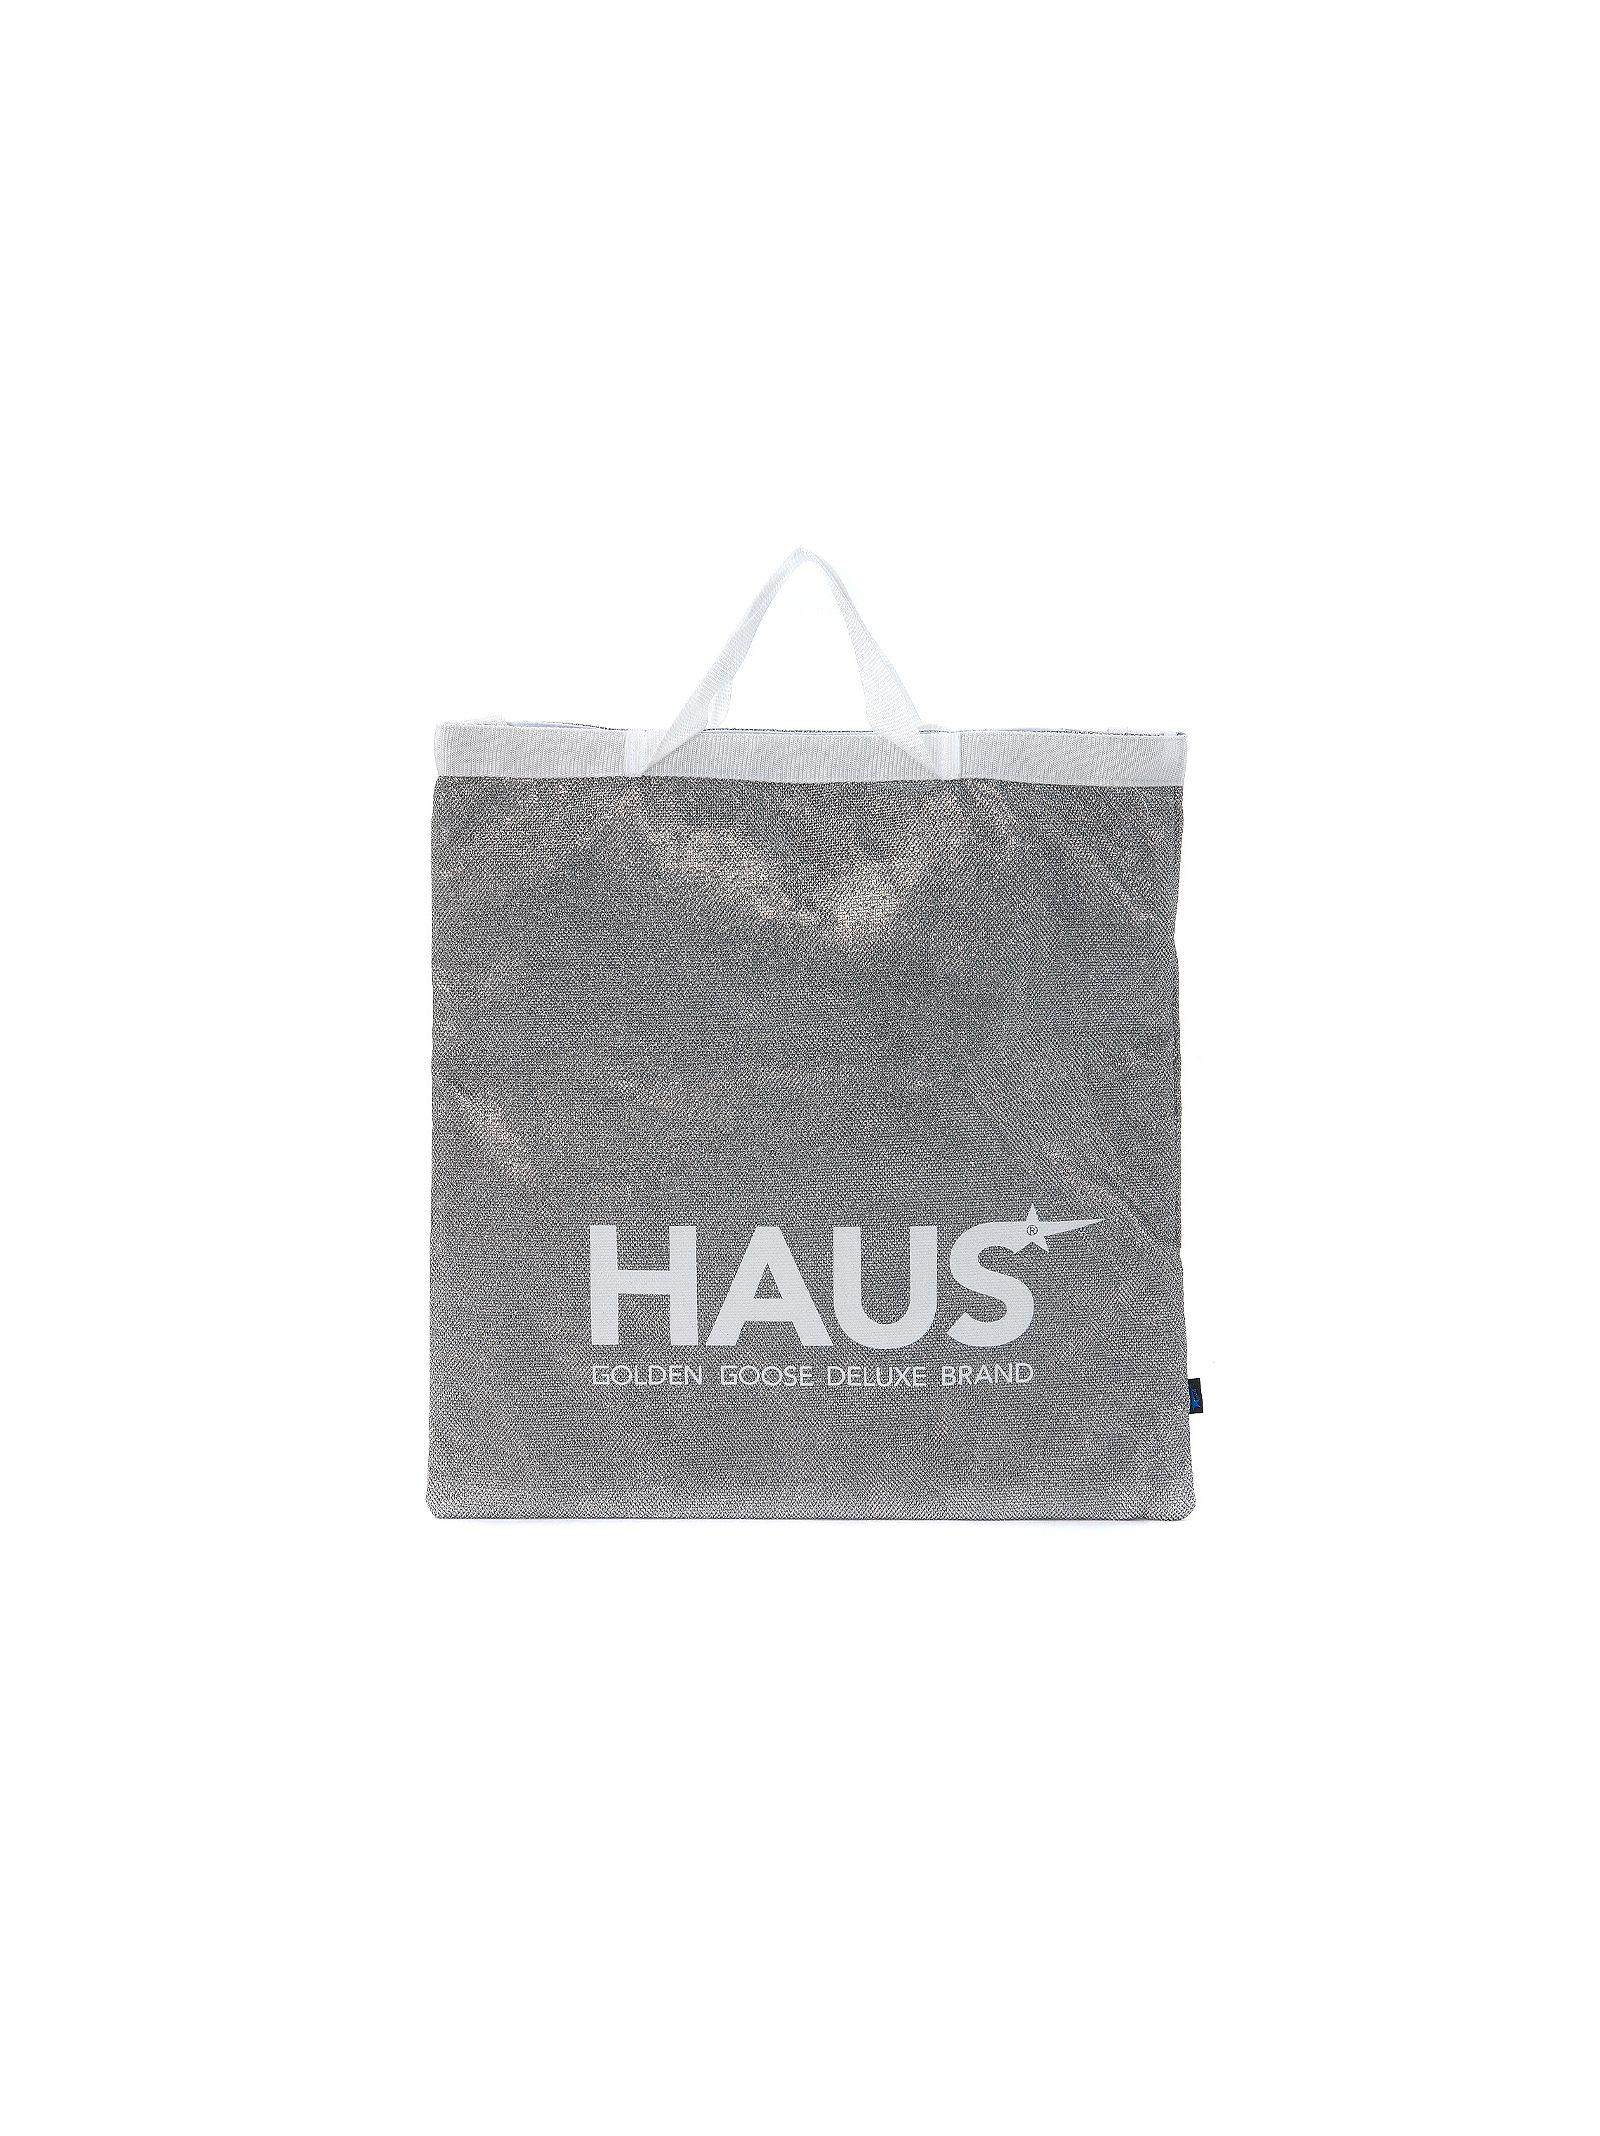 Haus Golden Goose Silver Glitter Shopping Handbag